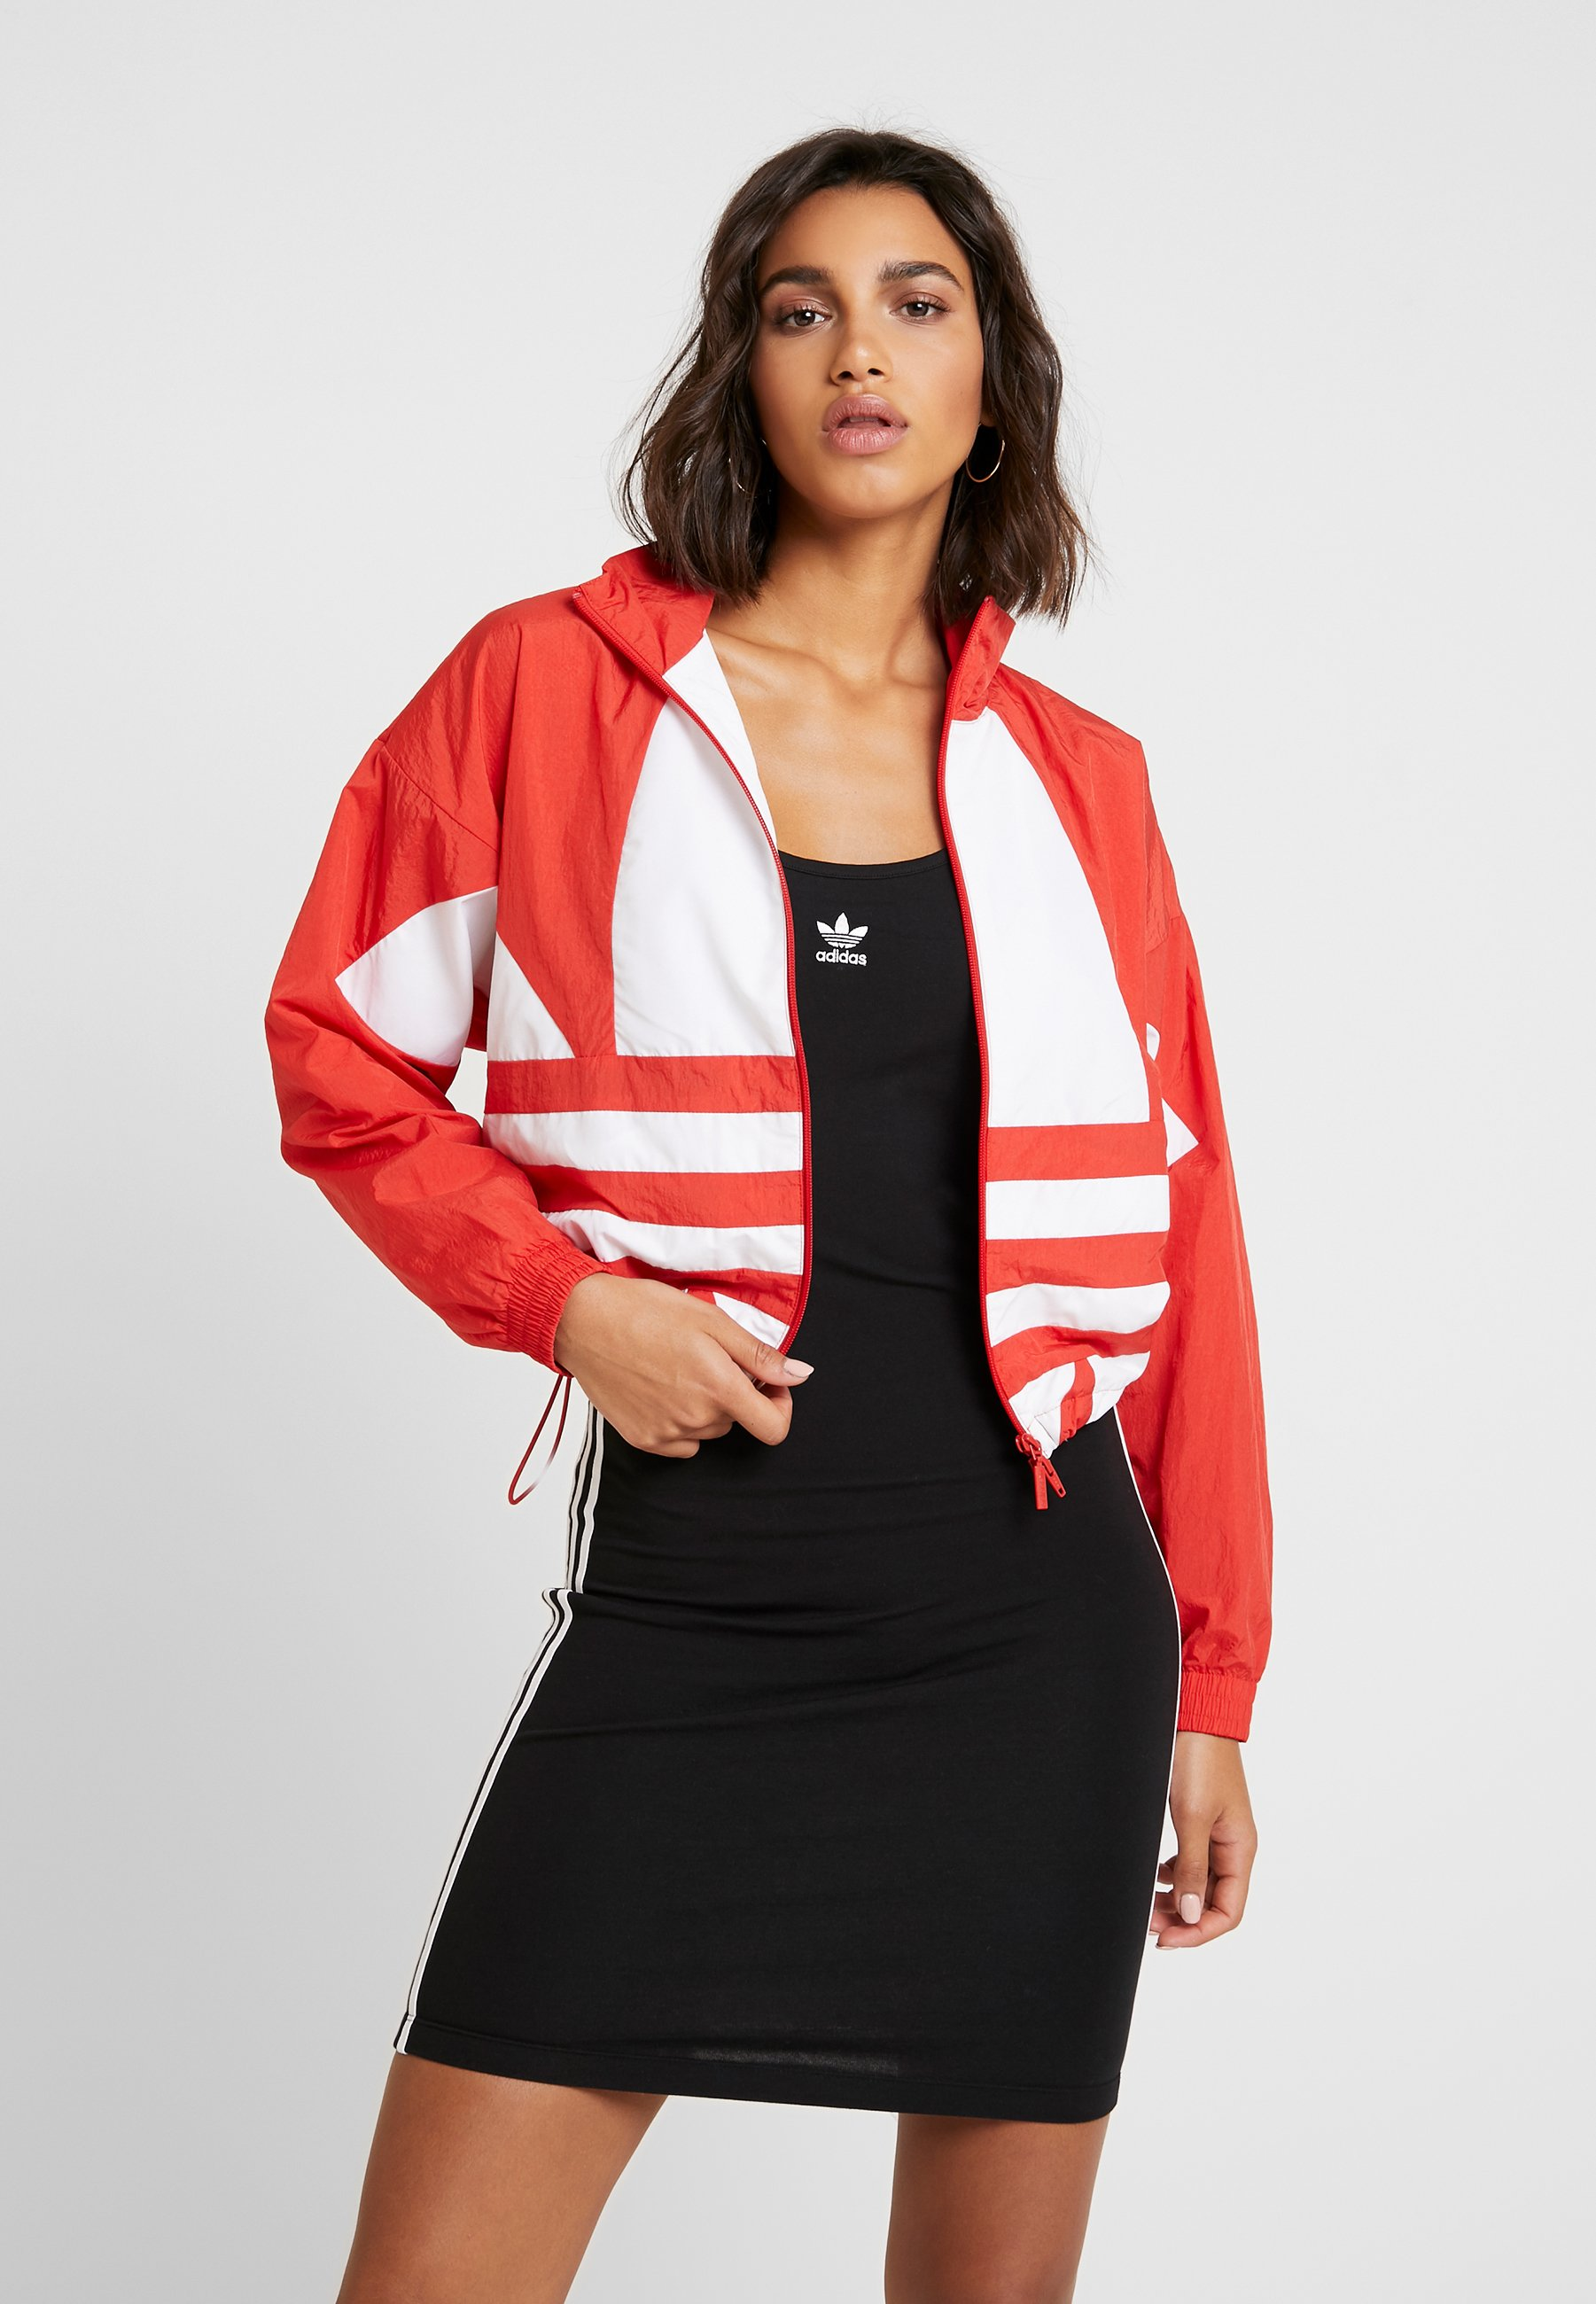 Hyper Online Women's Clothing adidas Originals LOGO Training jacket lush red/white 6m3e7sz0k